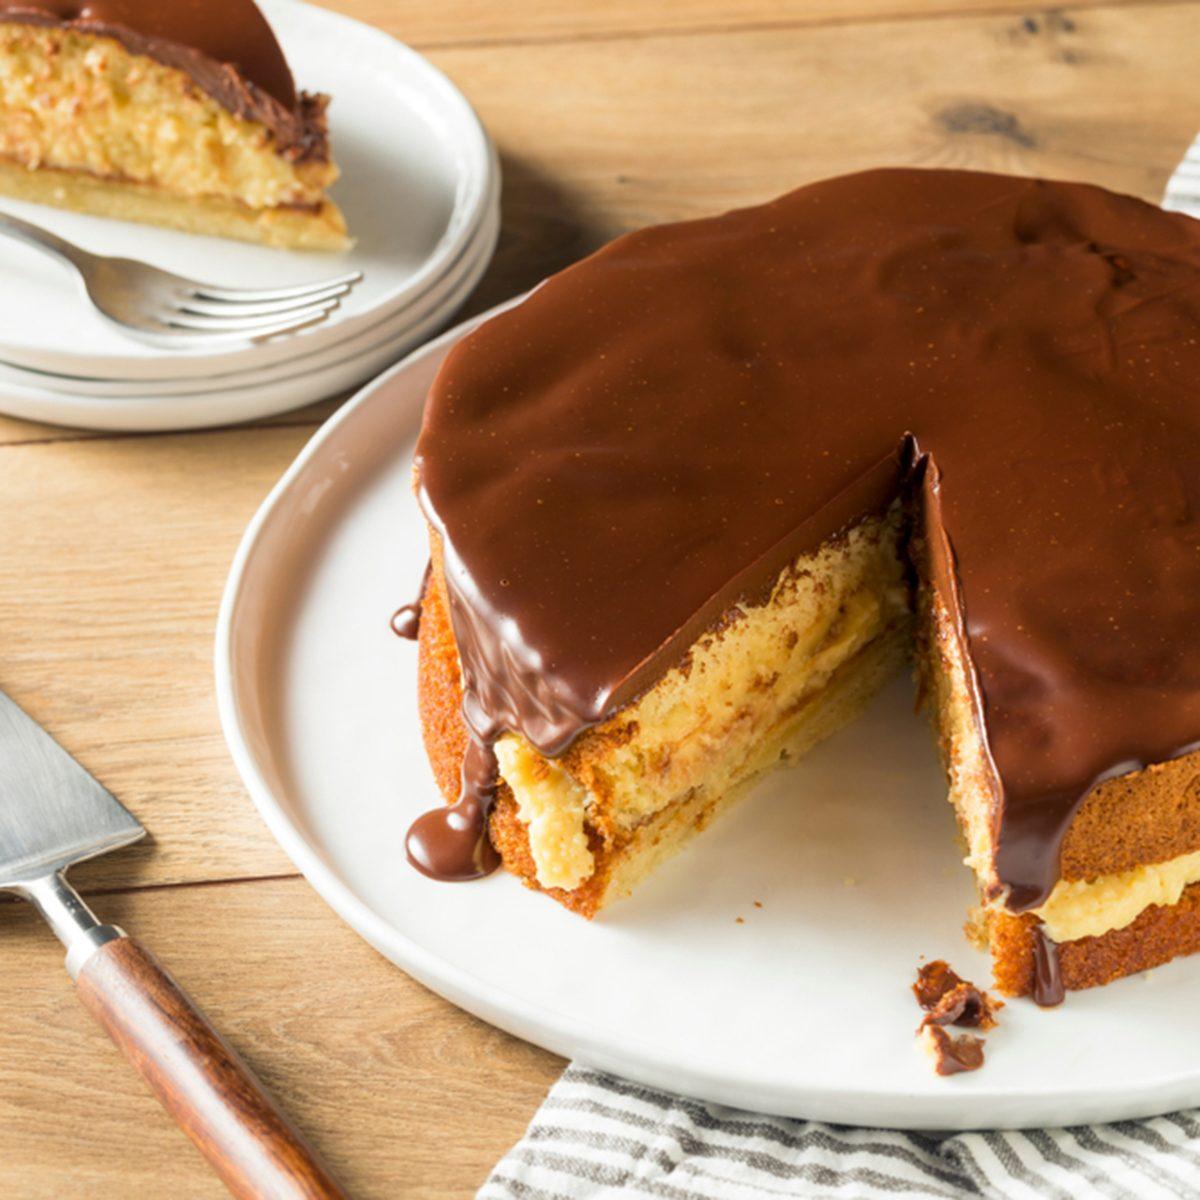 Homemade Chocolate Boston Cream Pie Ready to Eat; Shutterstock ID 1158397153; Job (TFH, TOH, RD, BNB, CWM, CM): TOH